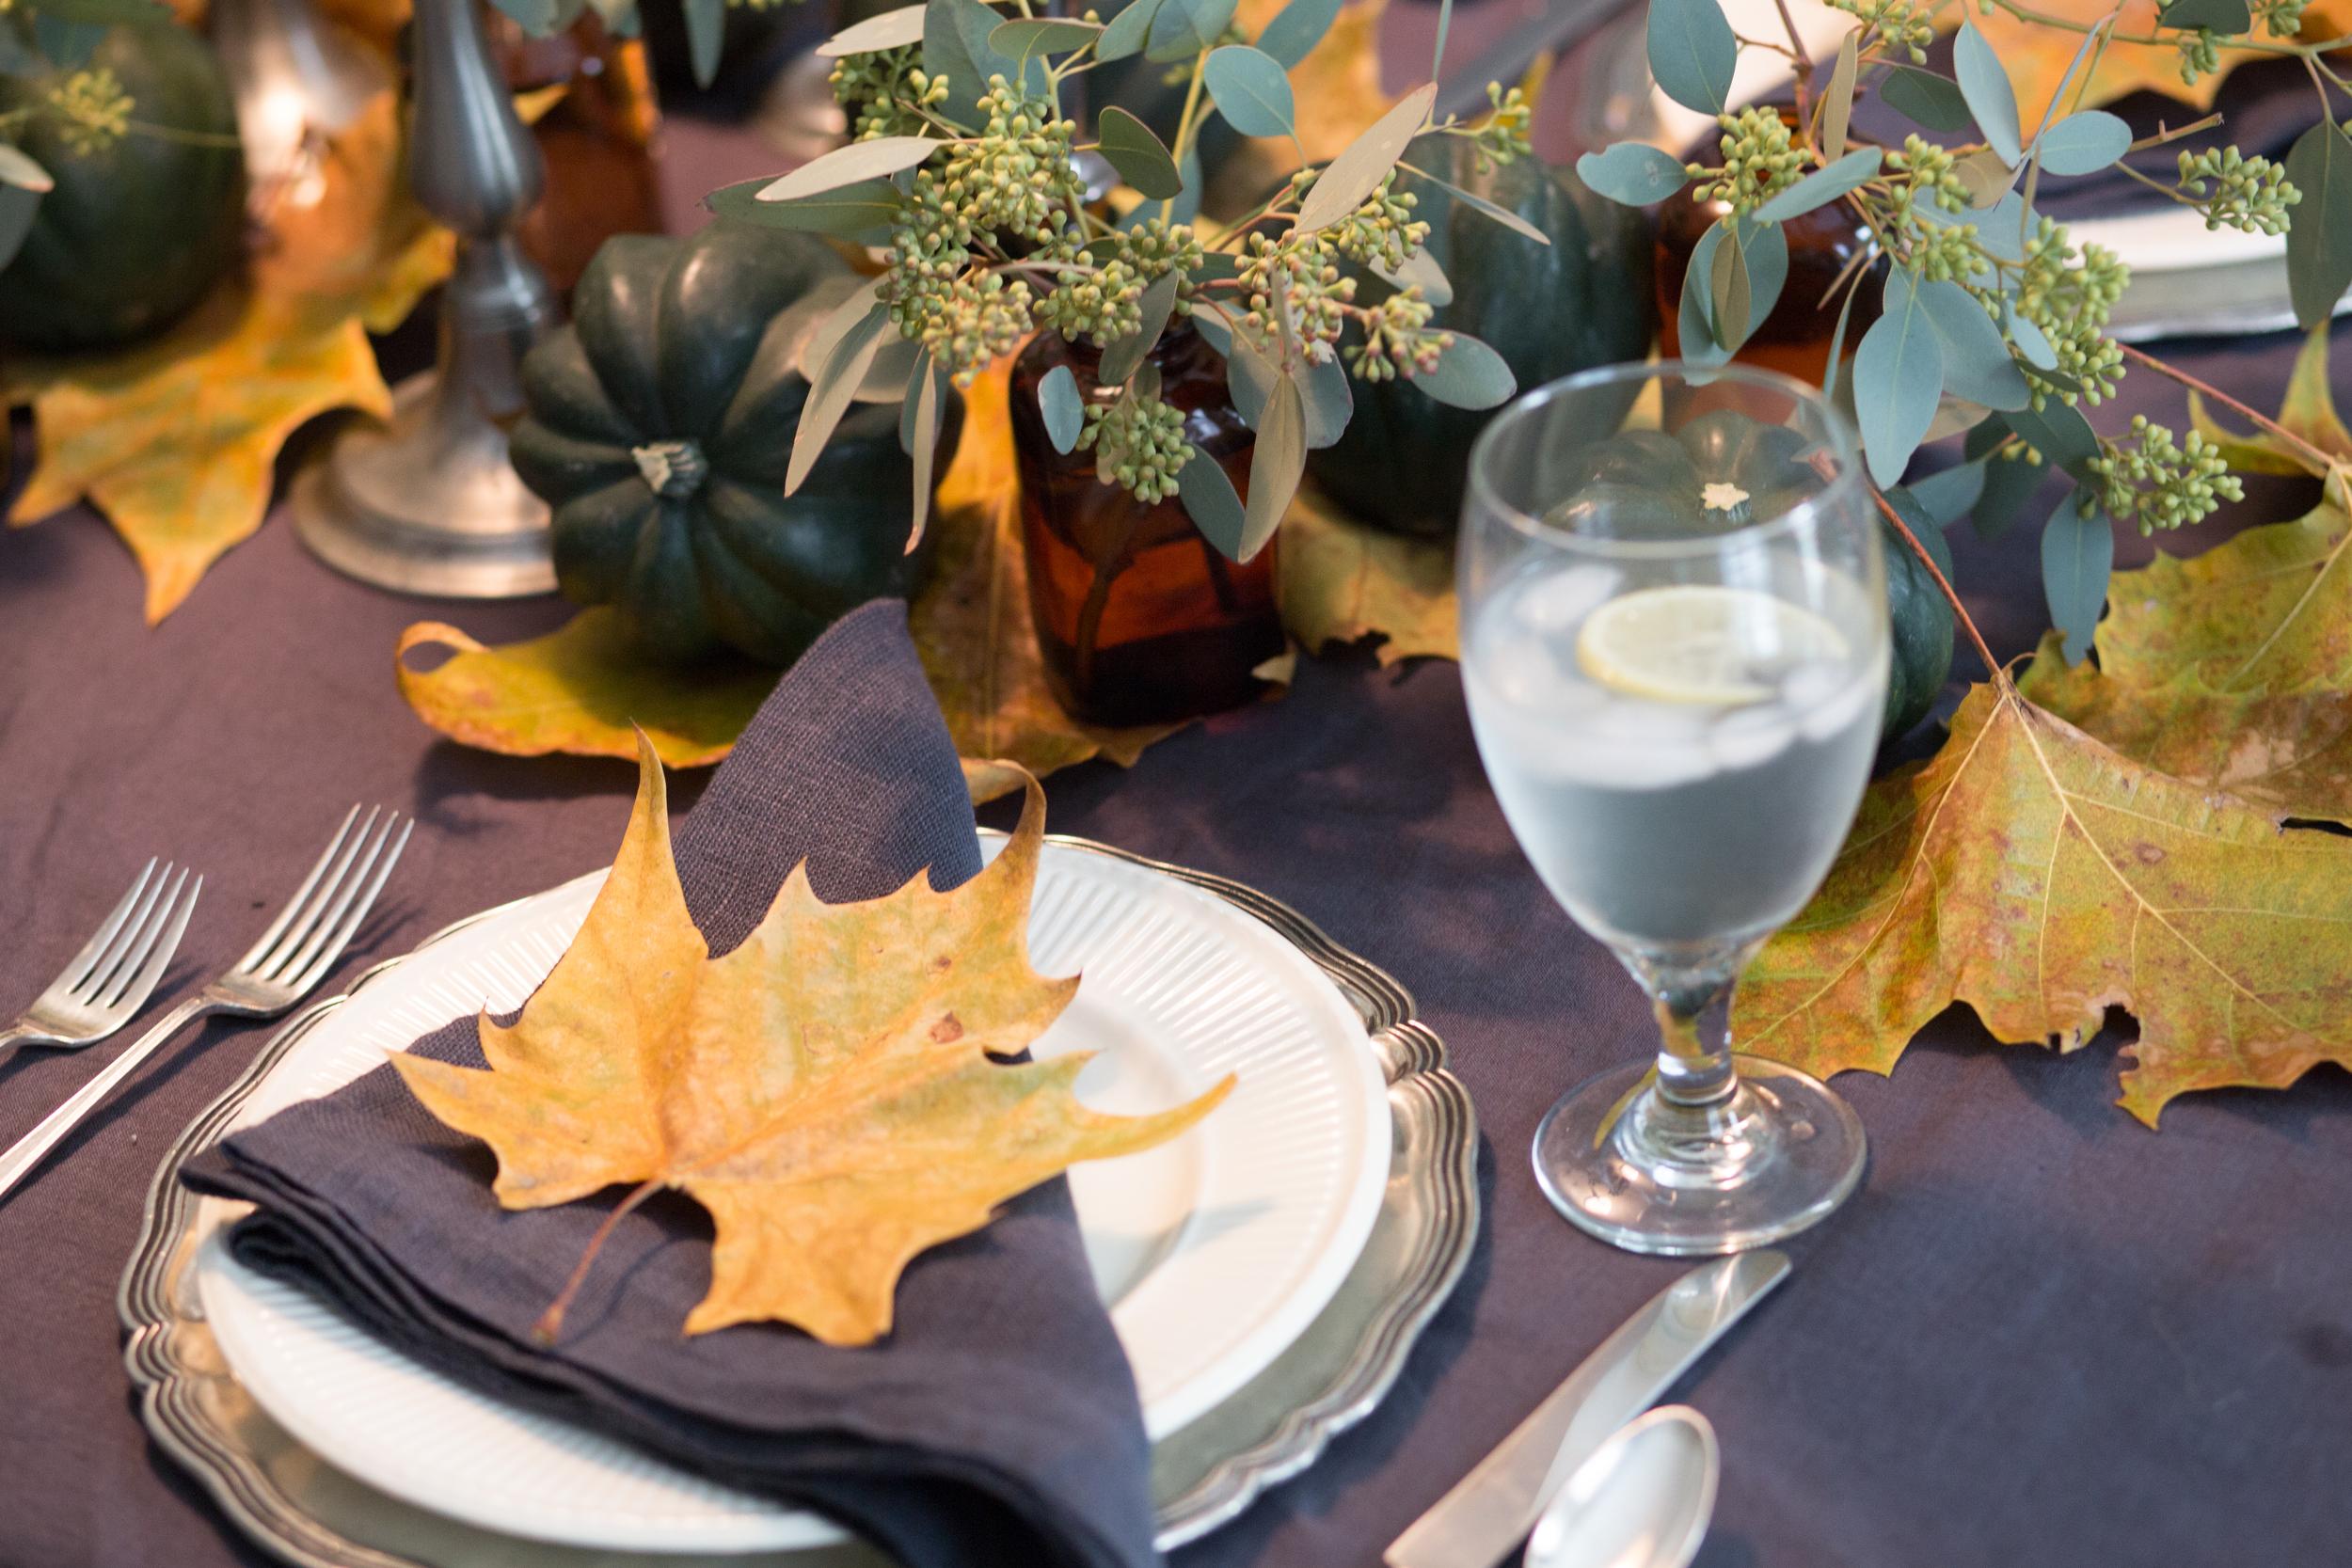 Thanksgiving / holiday tabletop setting design -ed by Carla Aston. Photographer: Tori Aston - http://toriaston.com